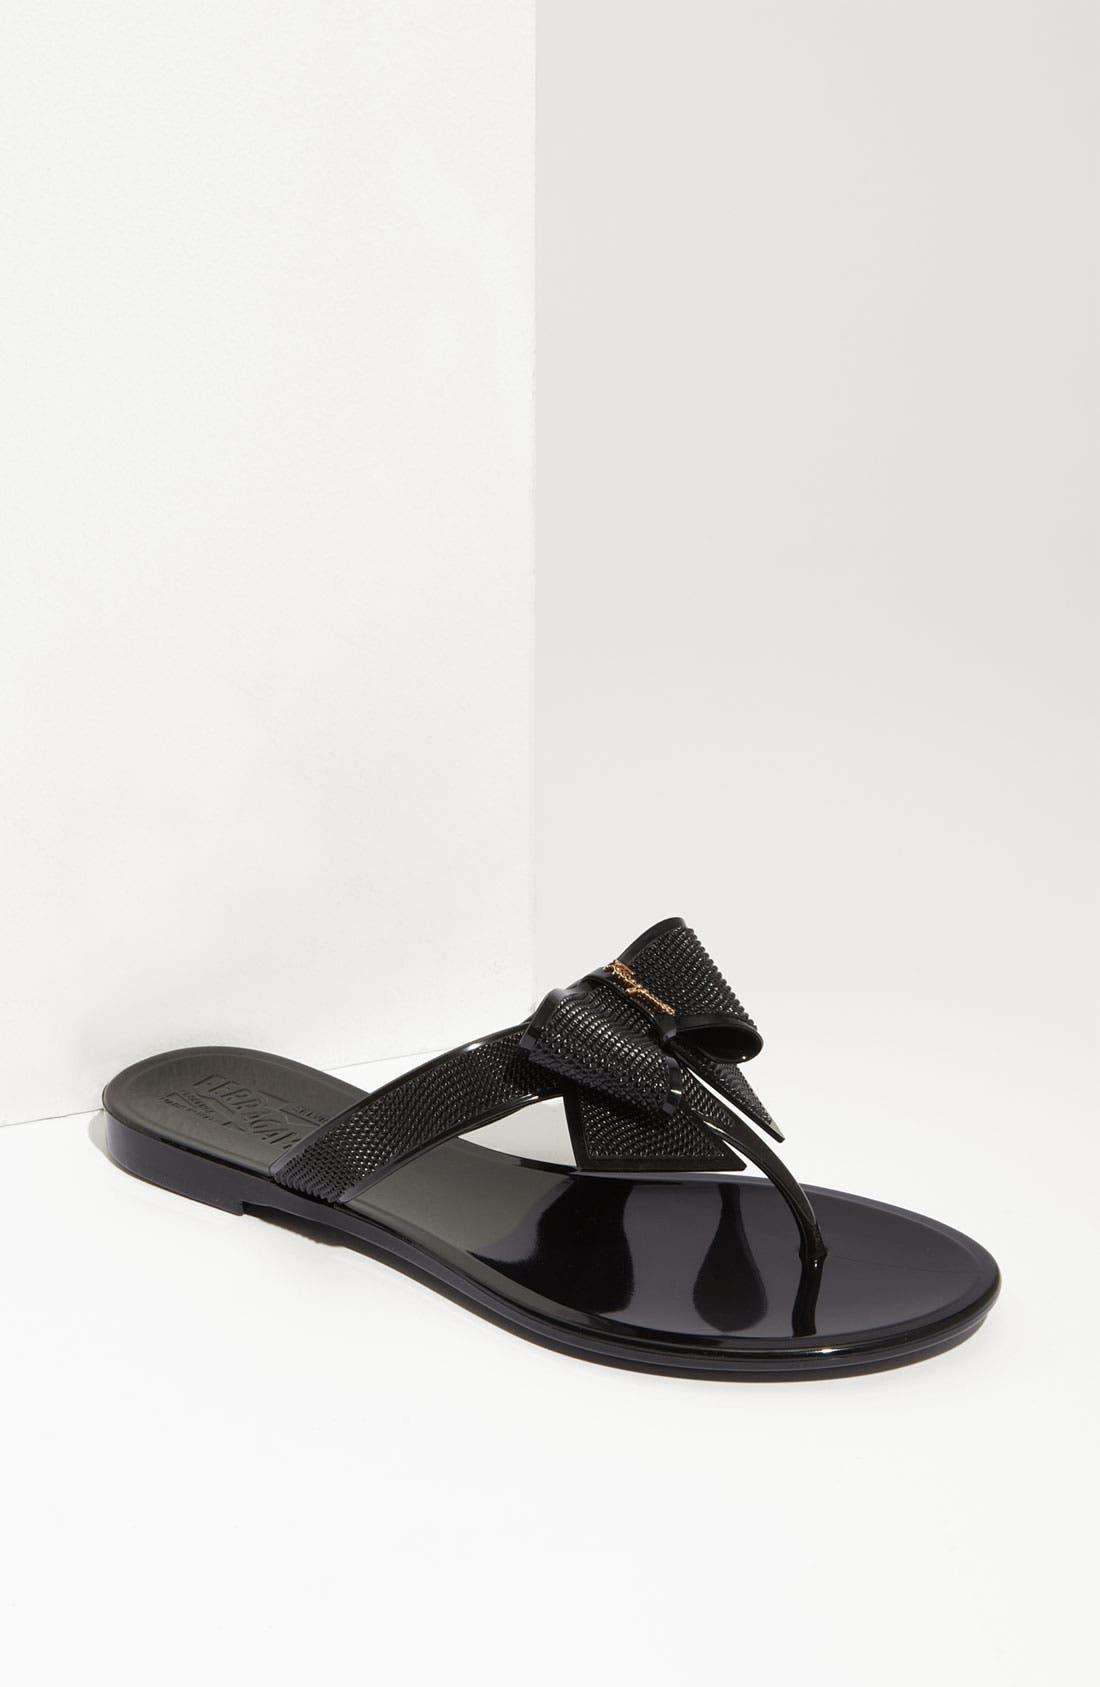 Main Image - Salvatore Ferragamo 'Bali' Sandal